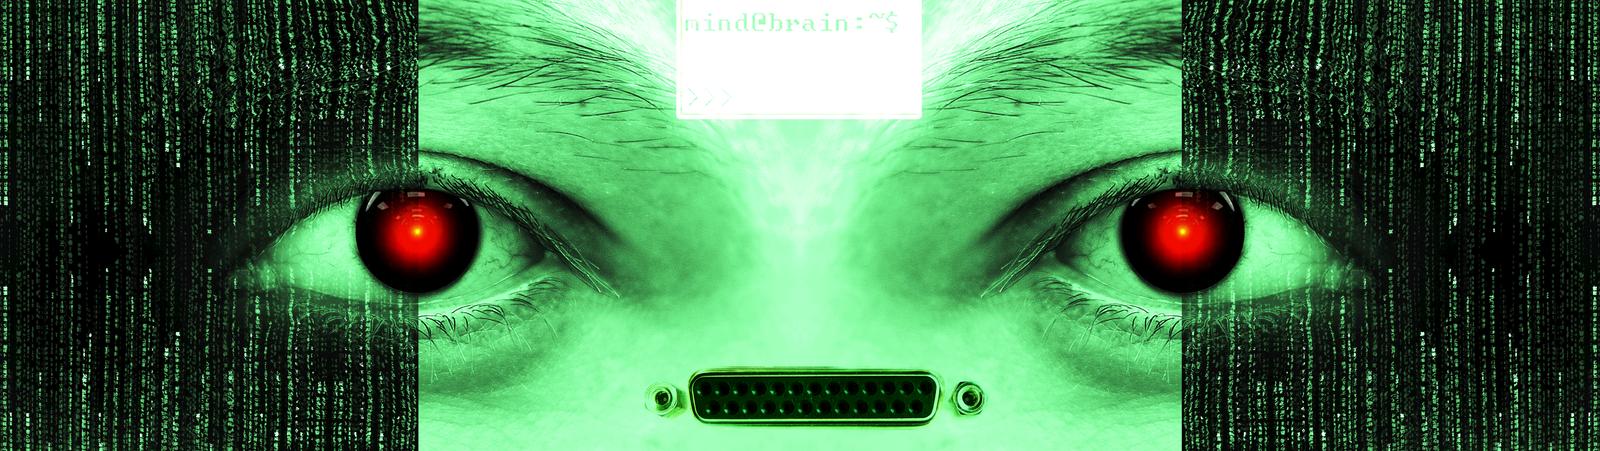 Matrix by Teeth-Man